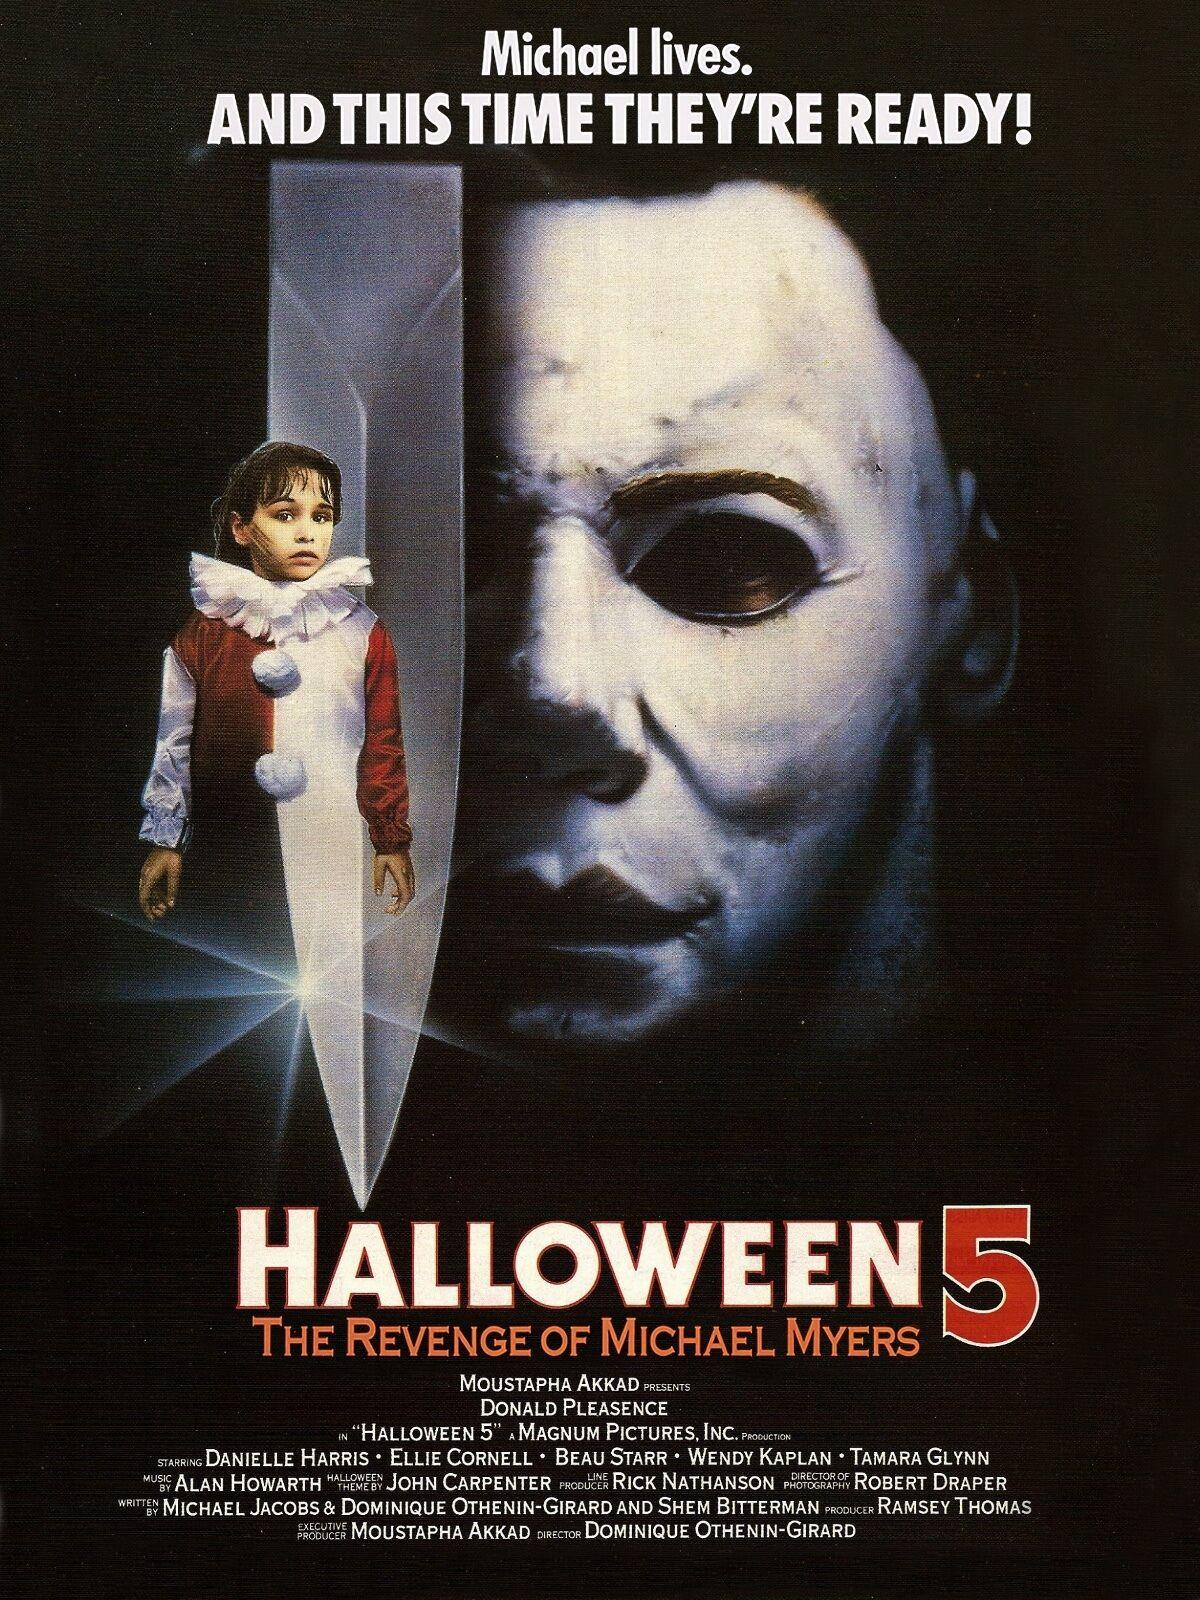 Michael Myers Poster | eBay